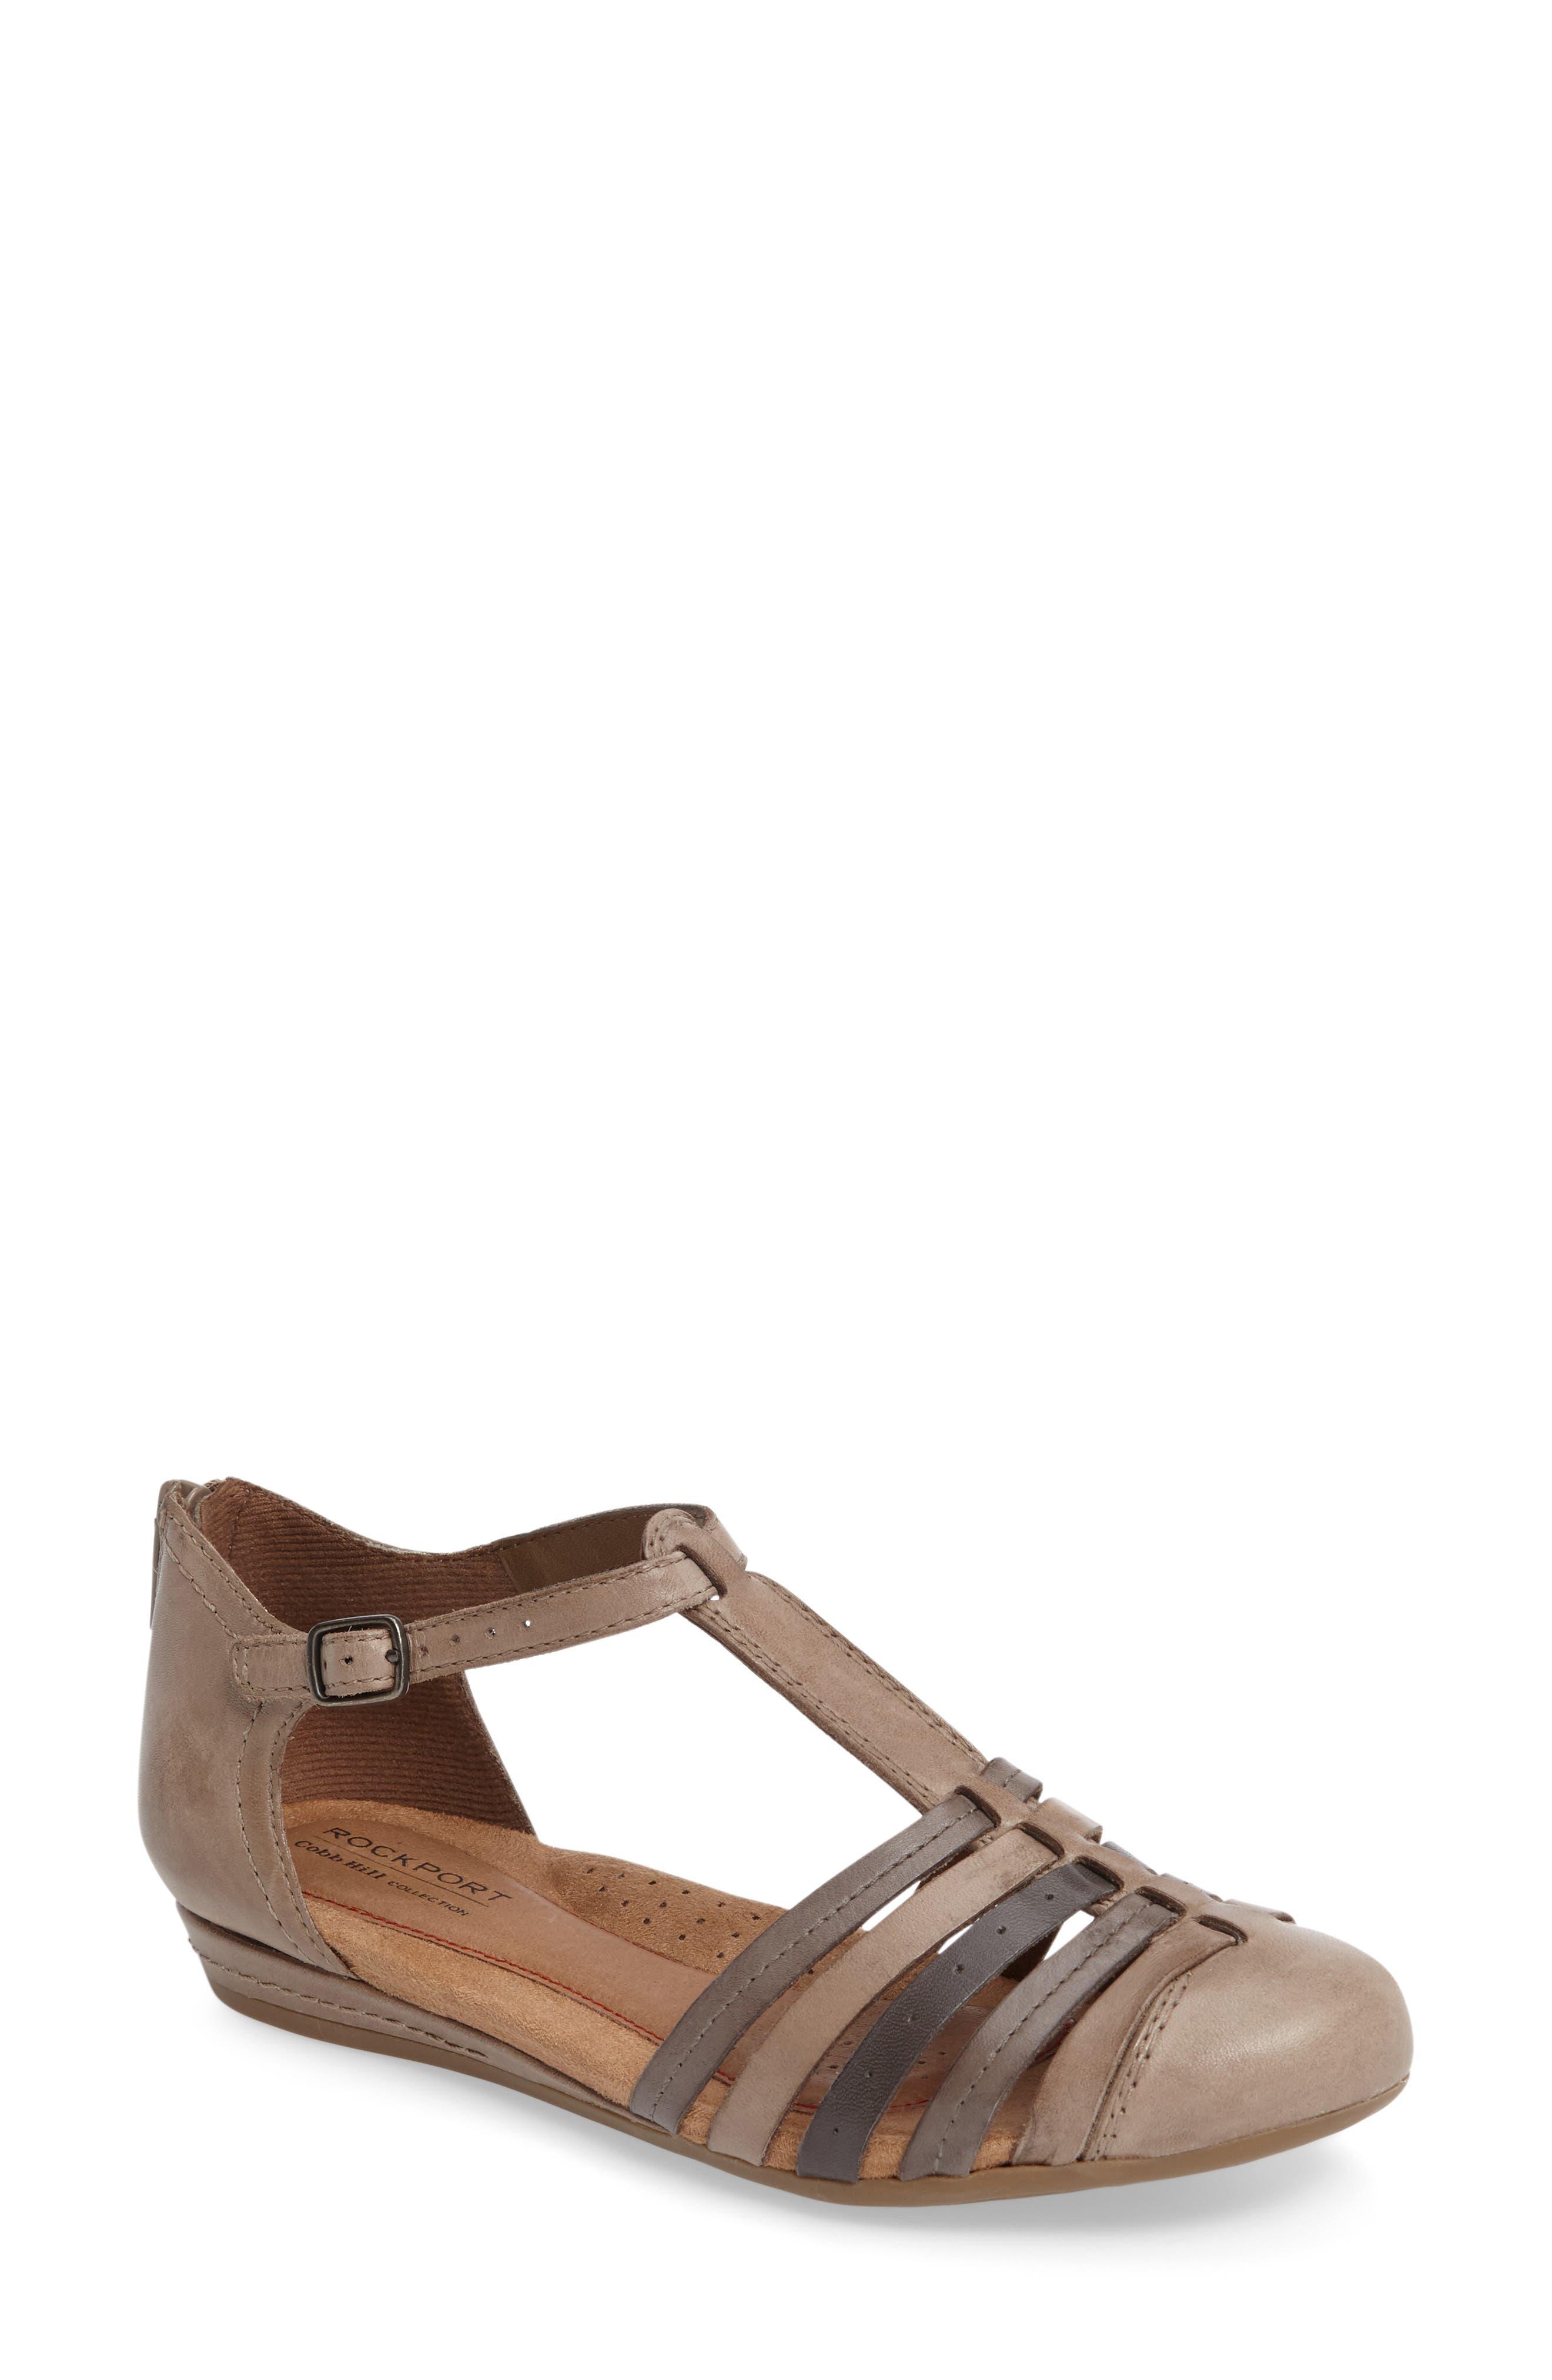 Rockport Cobb Hill Galway T-Strap Sandal (Women)